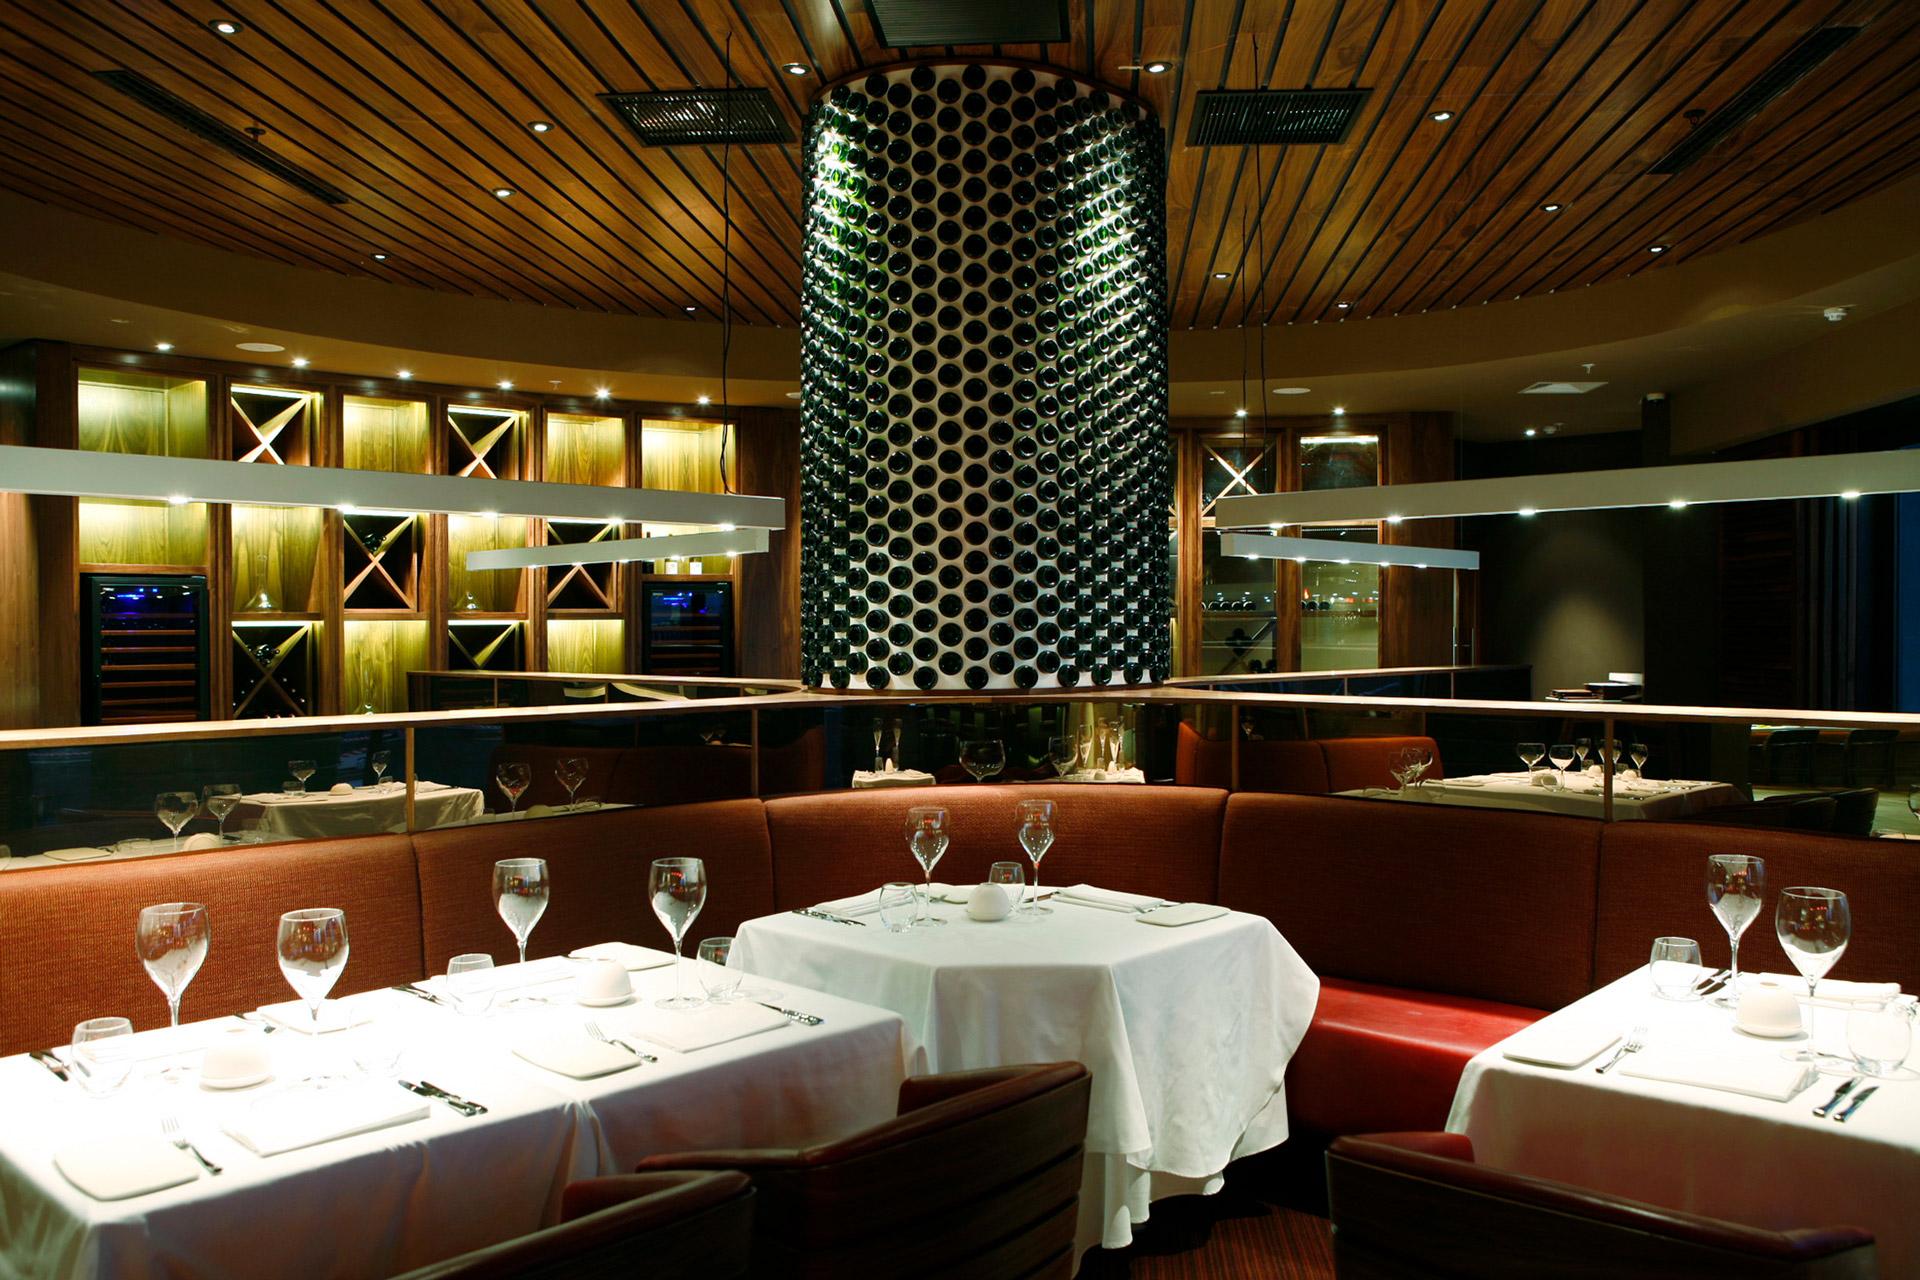 San and Vin at Sandton Sun restaurant modern design